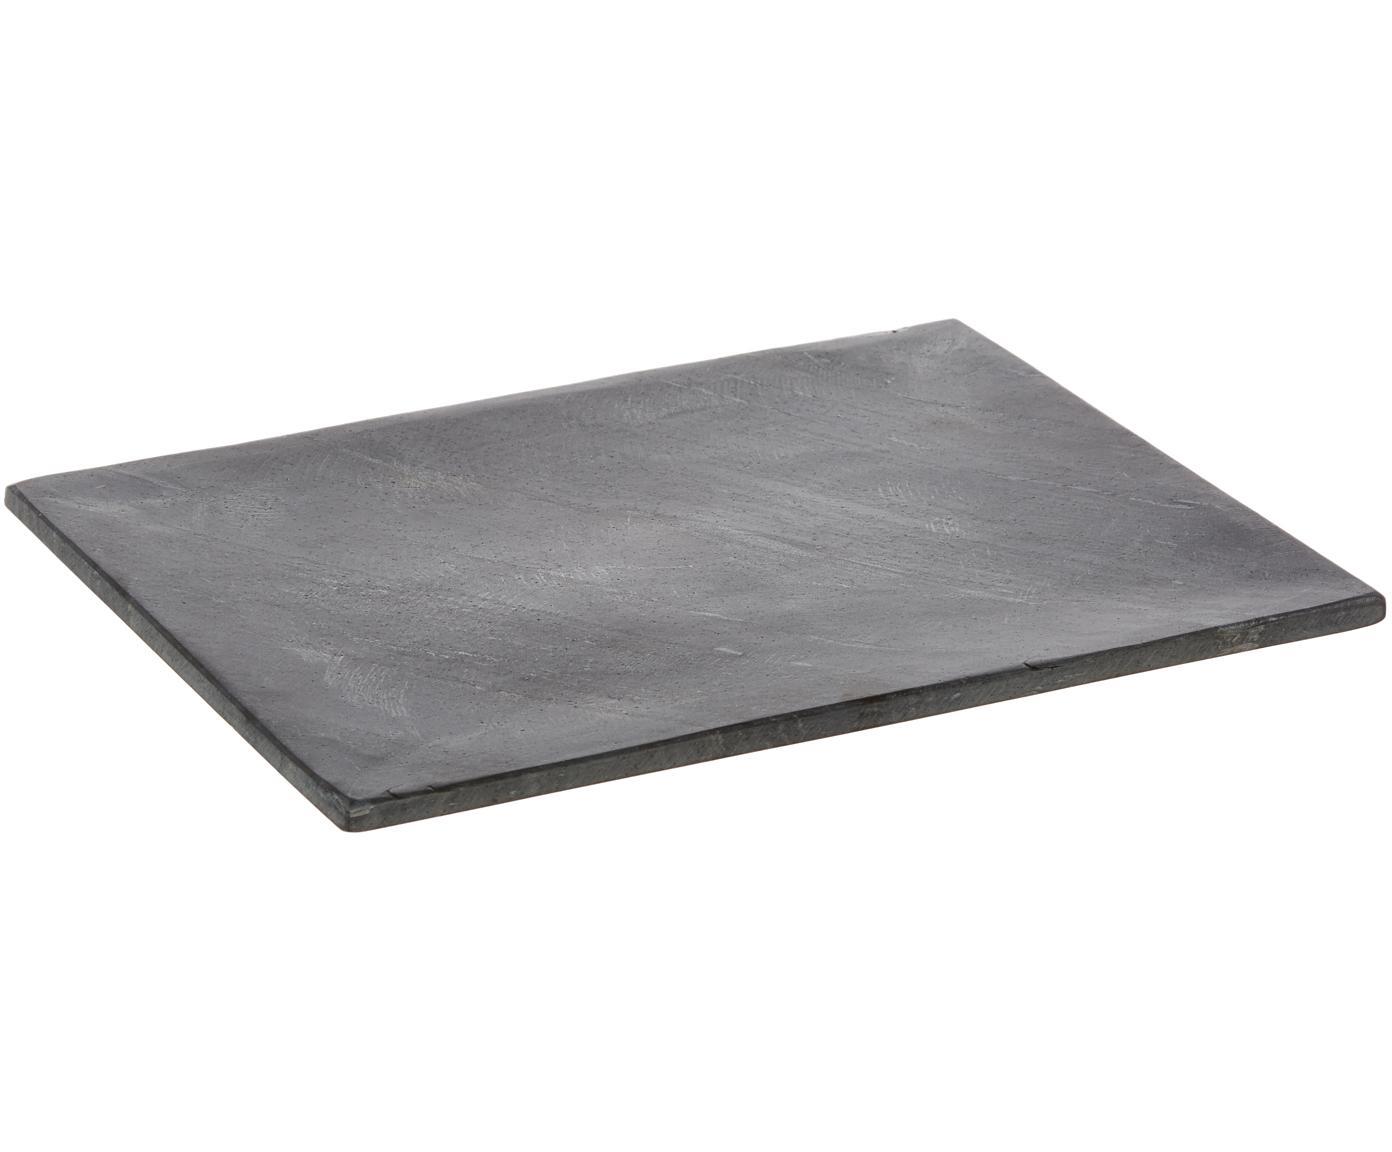 Granit-Servierplatte Klevina, Granit, Grau, 28 x 2 cm